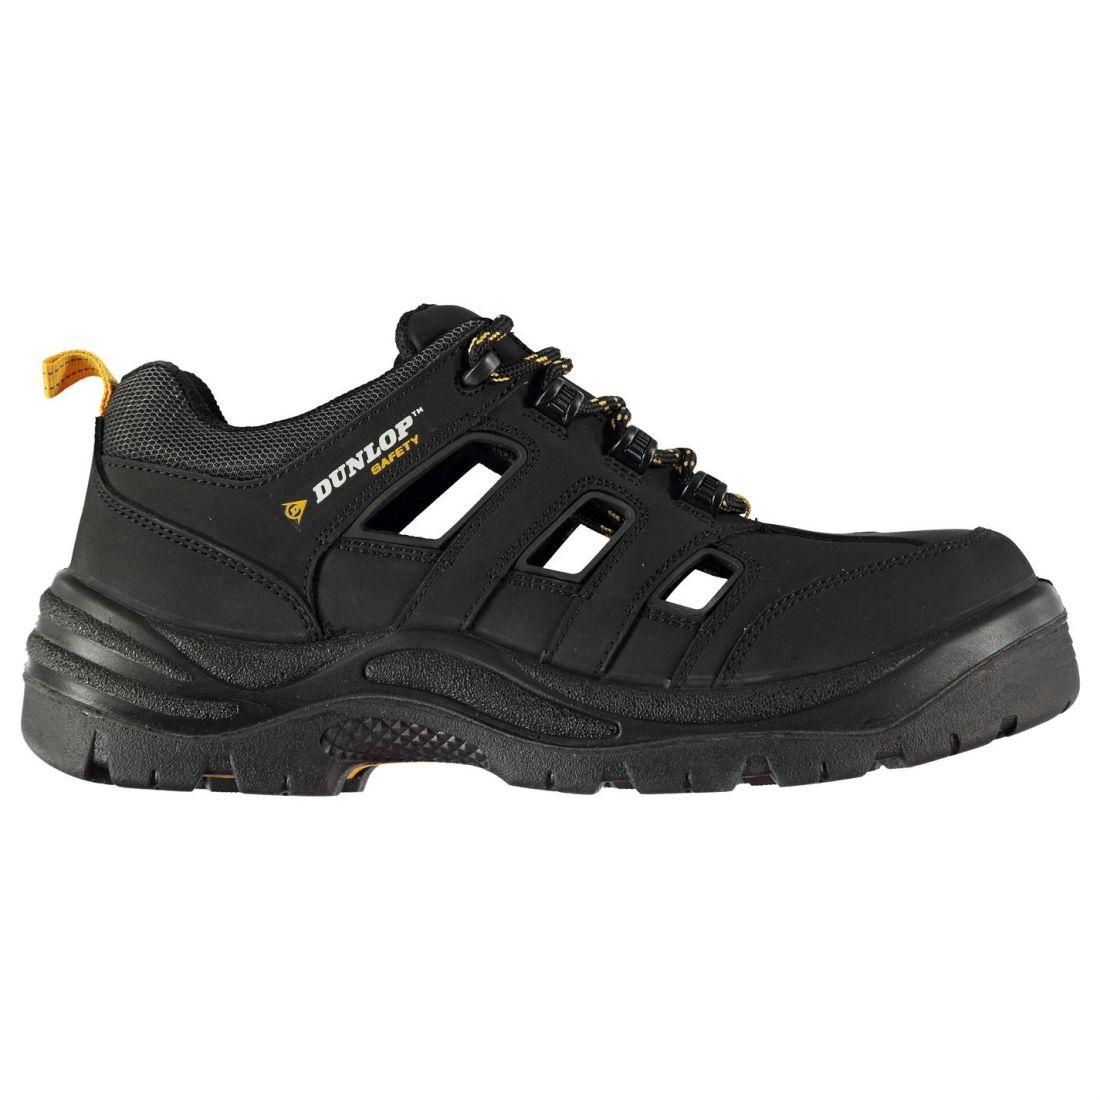 Dunlop Hawaii SB Mens Gents Securety Boots